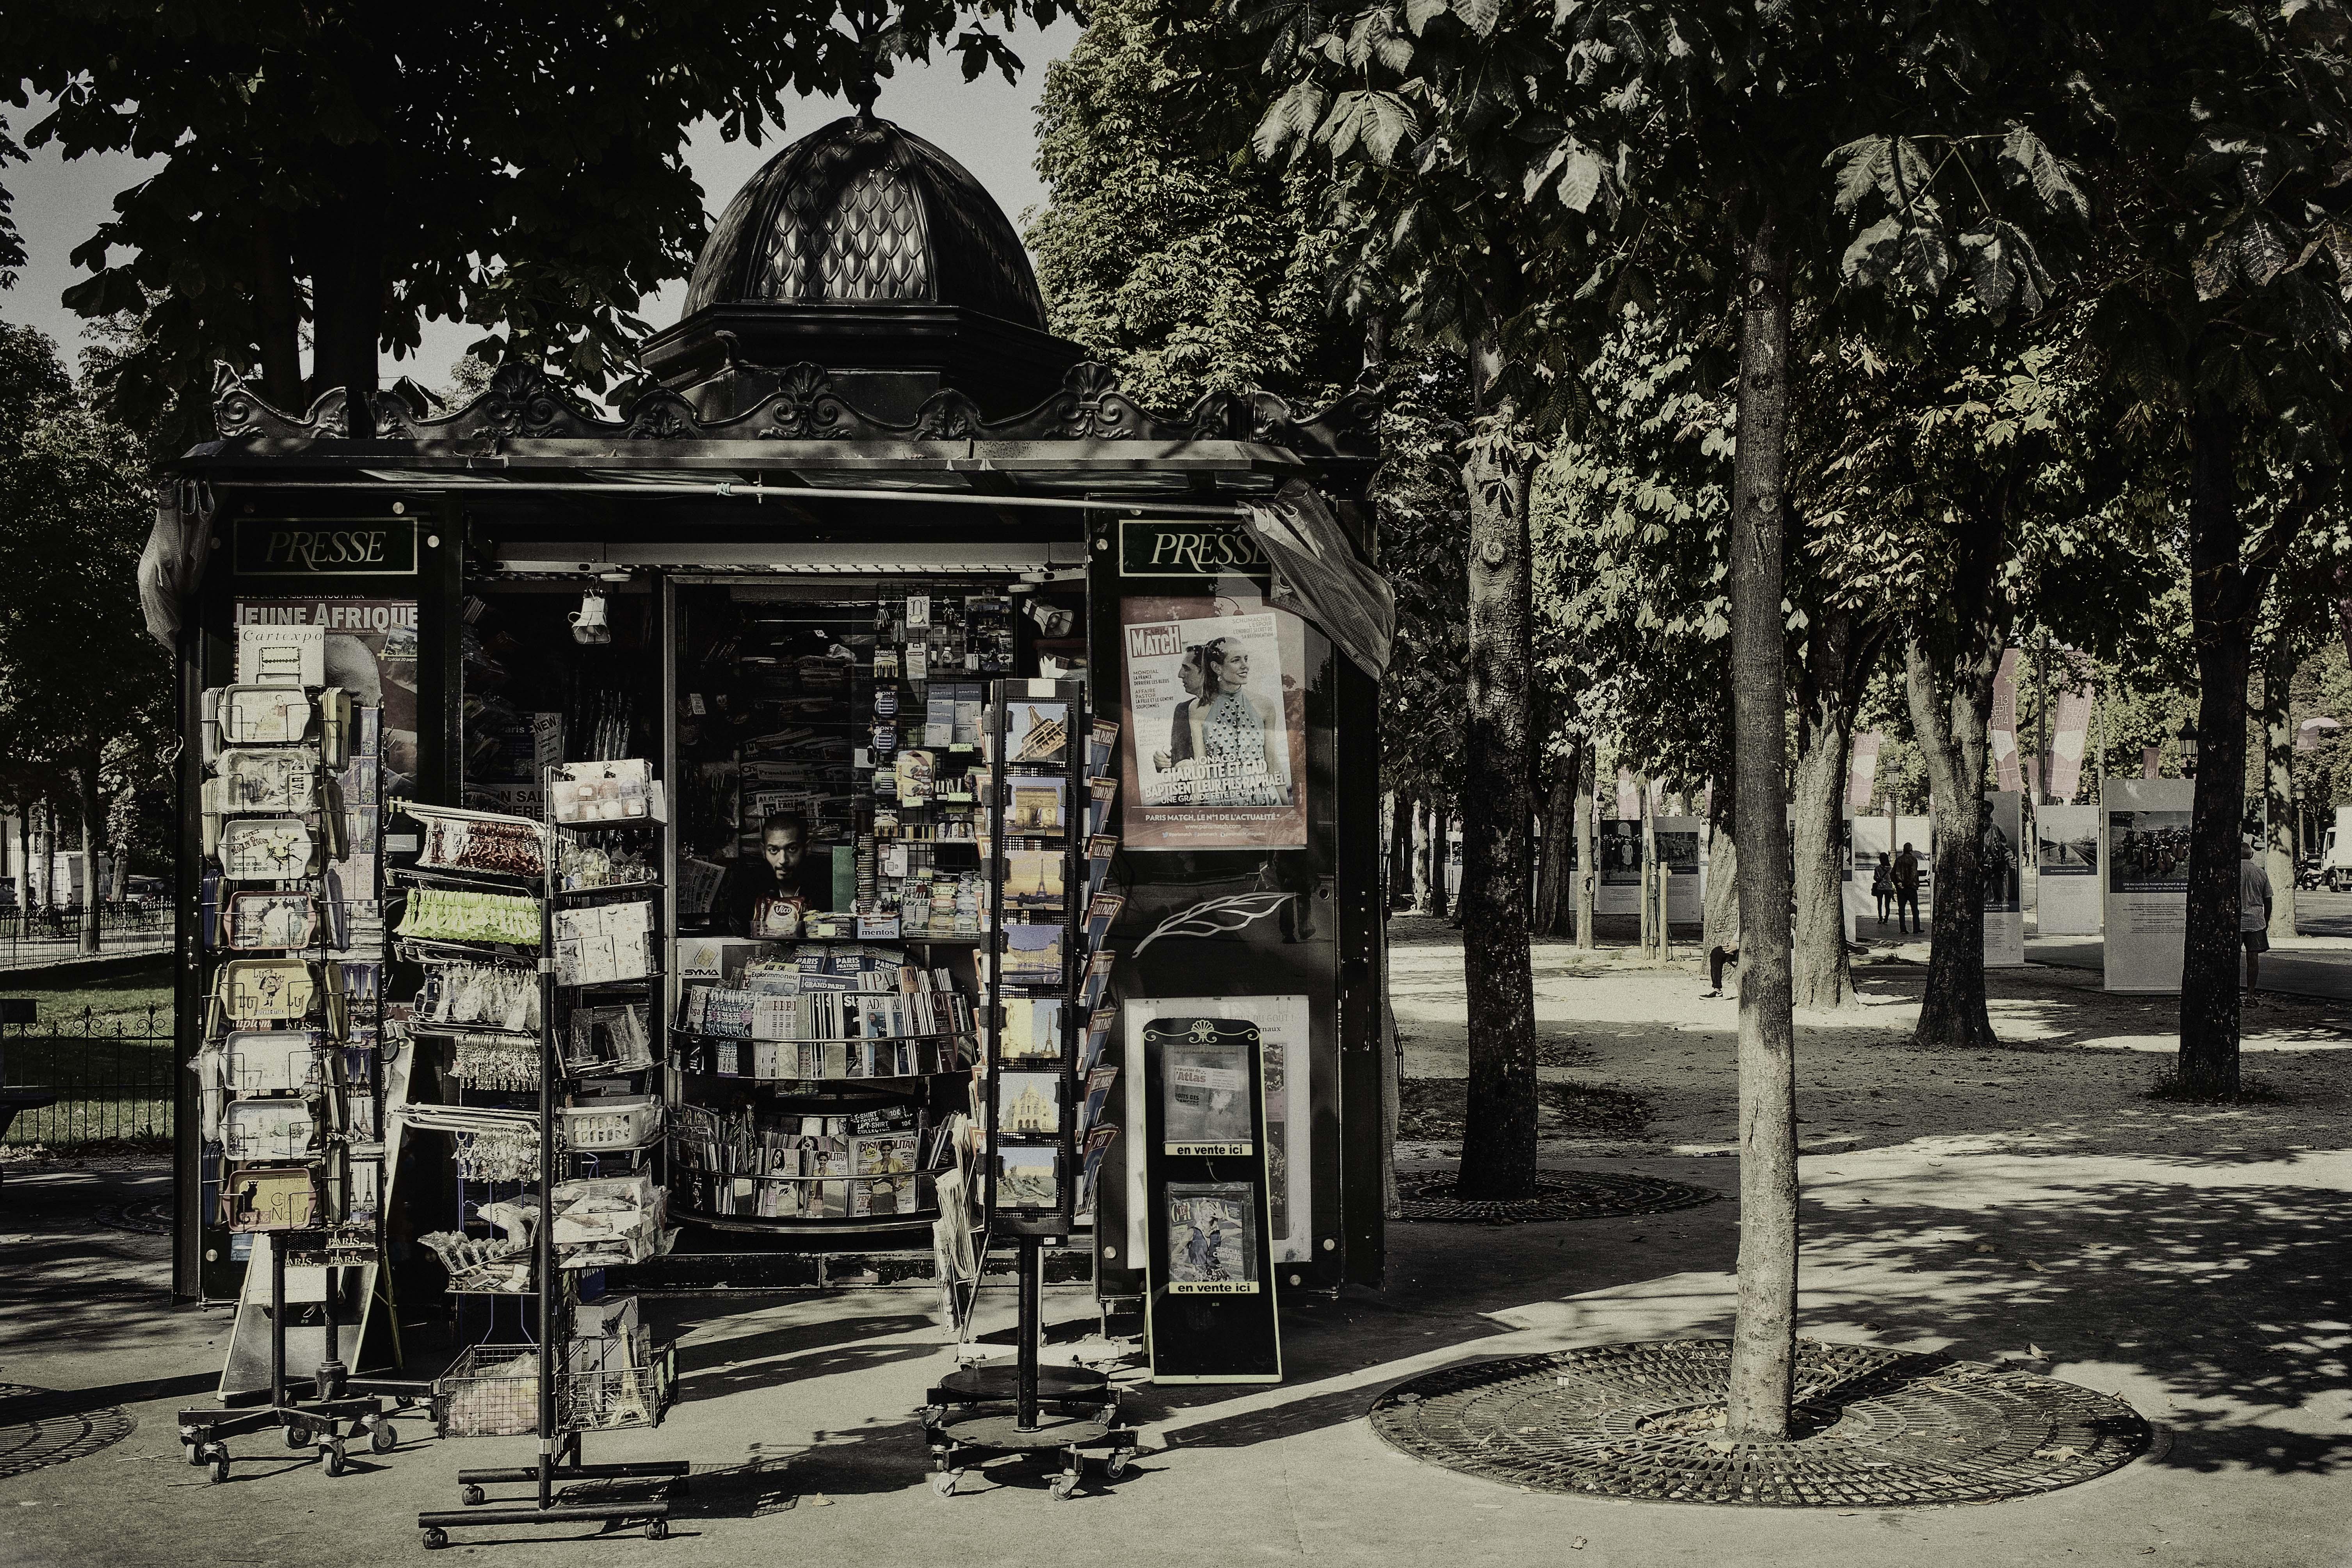 News, Paris, France